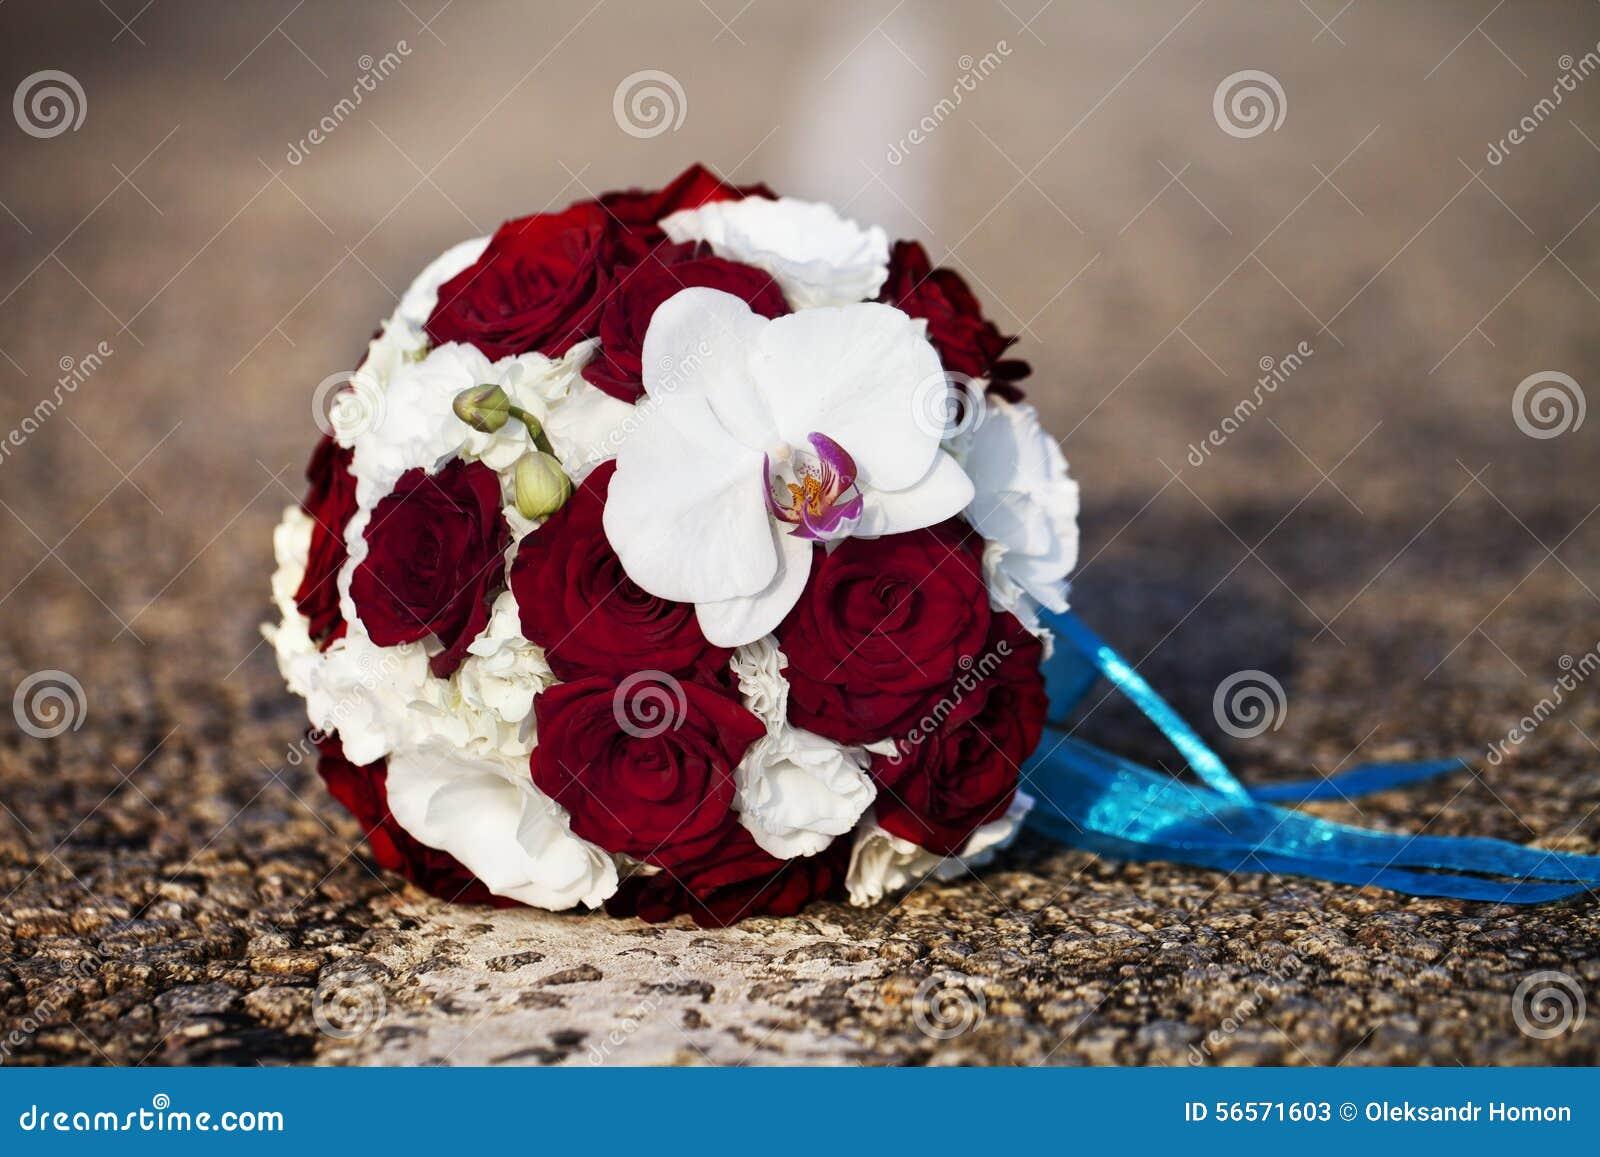 Download γάμος πρώτου πλάνου εστίασης 3 ανθοδεσμών Στοκ Εικόνα - εικόνα από bloodsuckers, πράσινος: 56571603